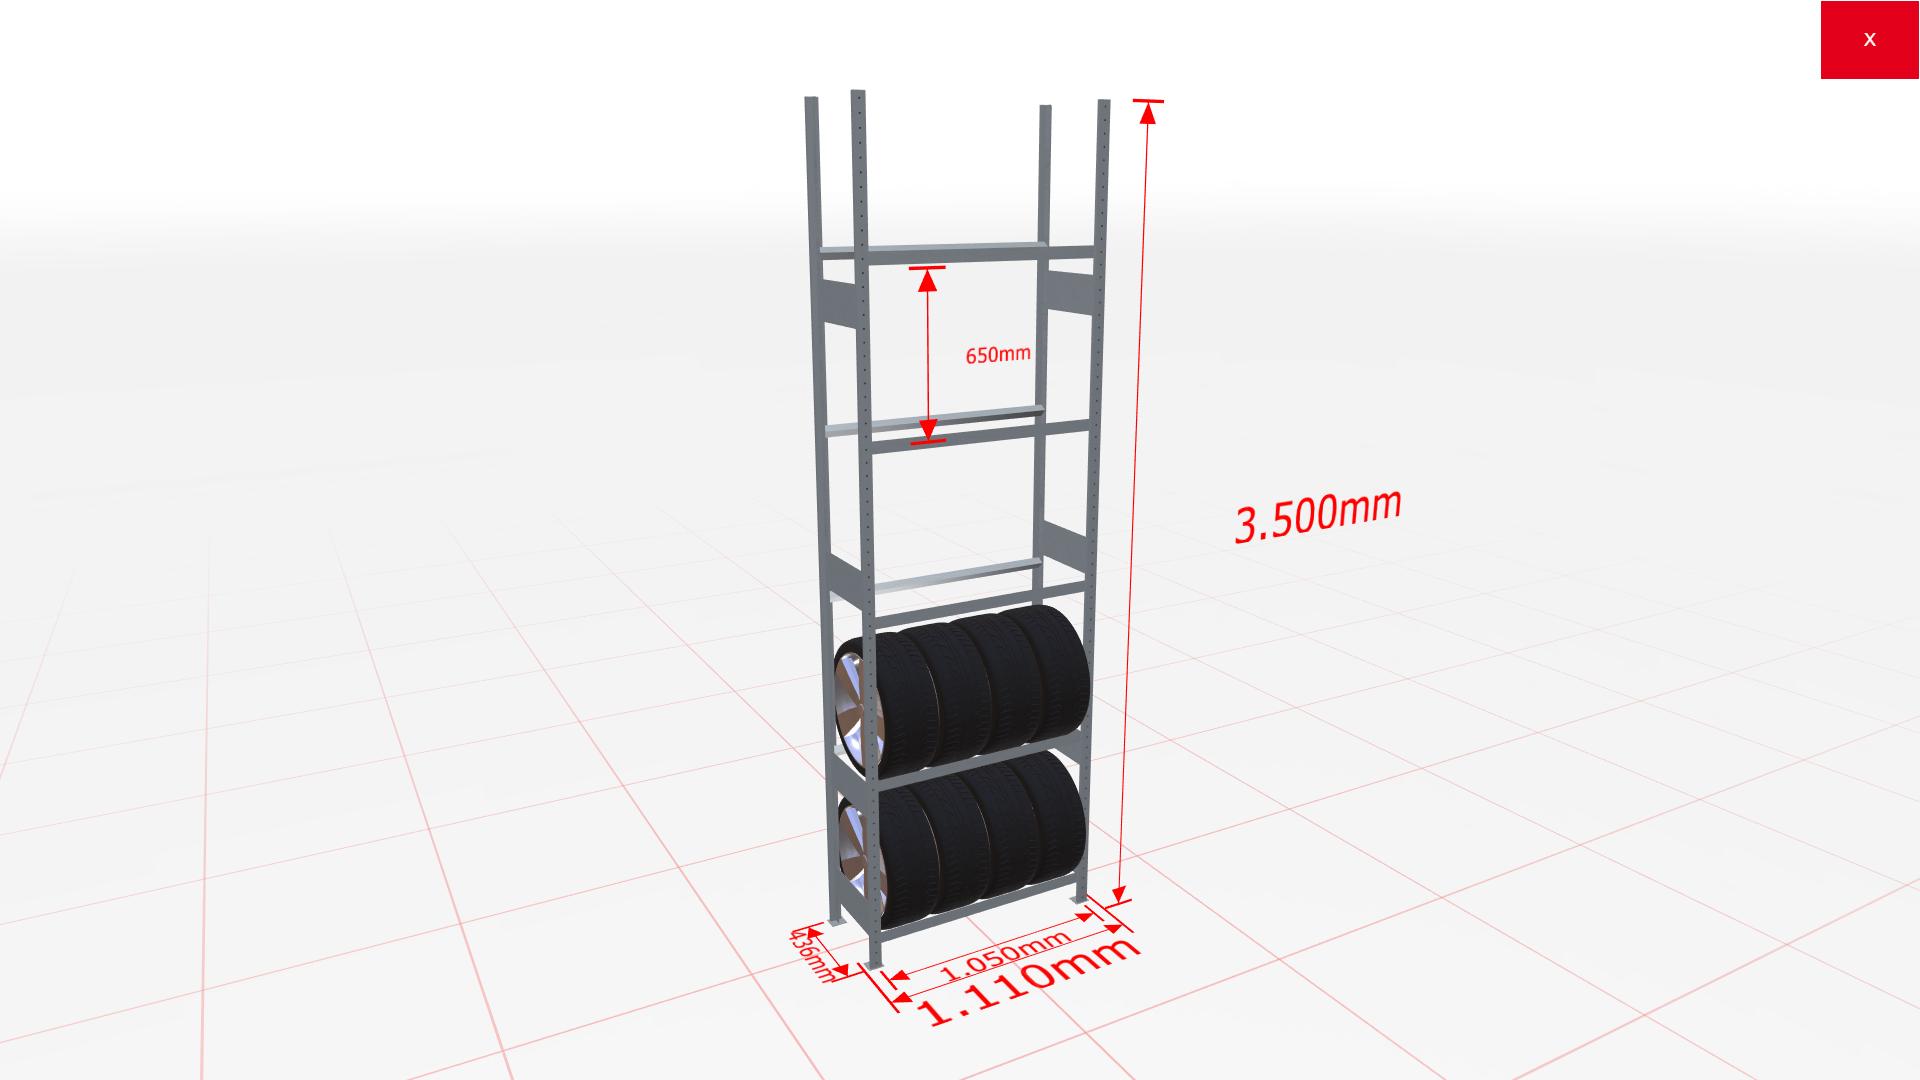 Räderregal Grundregal SCHULTE Lagertechnik 3500x1050x400 mm – 5 Ebenen á 1050 mm, verzinkt